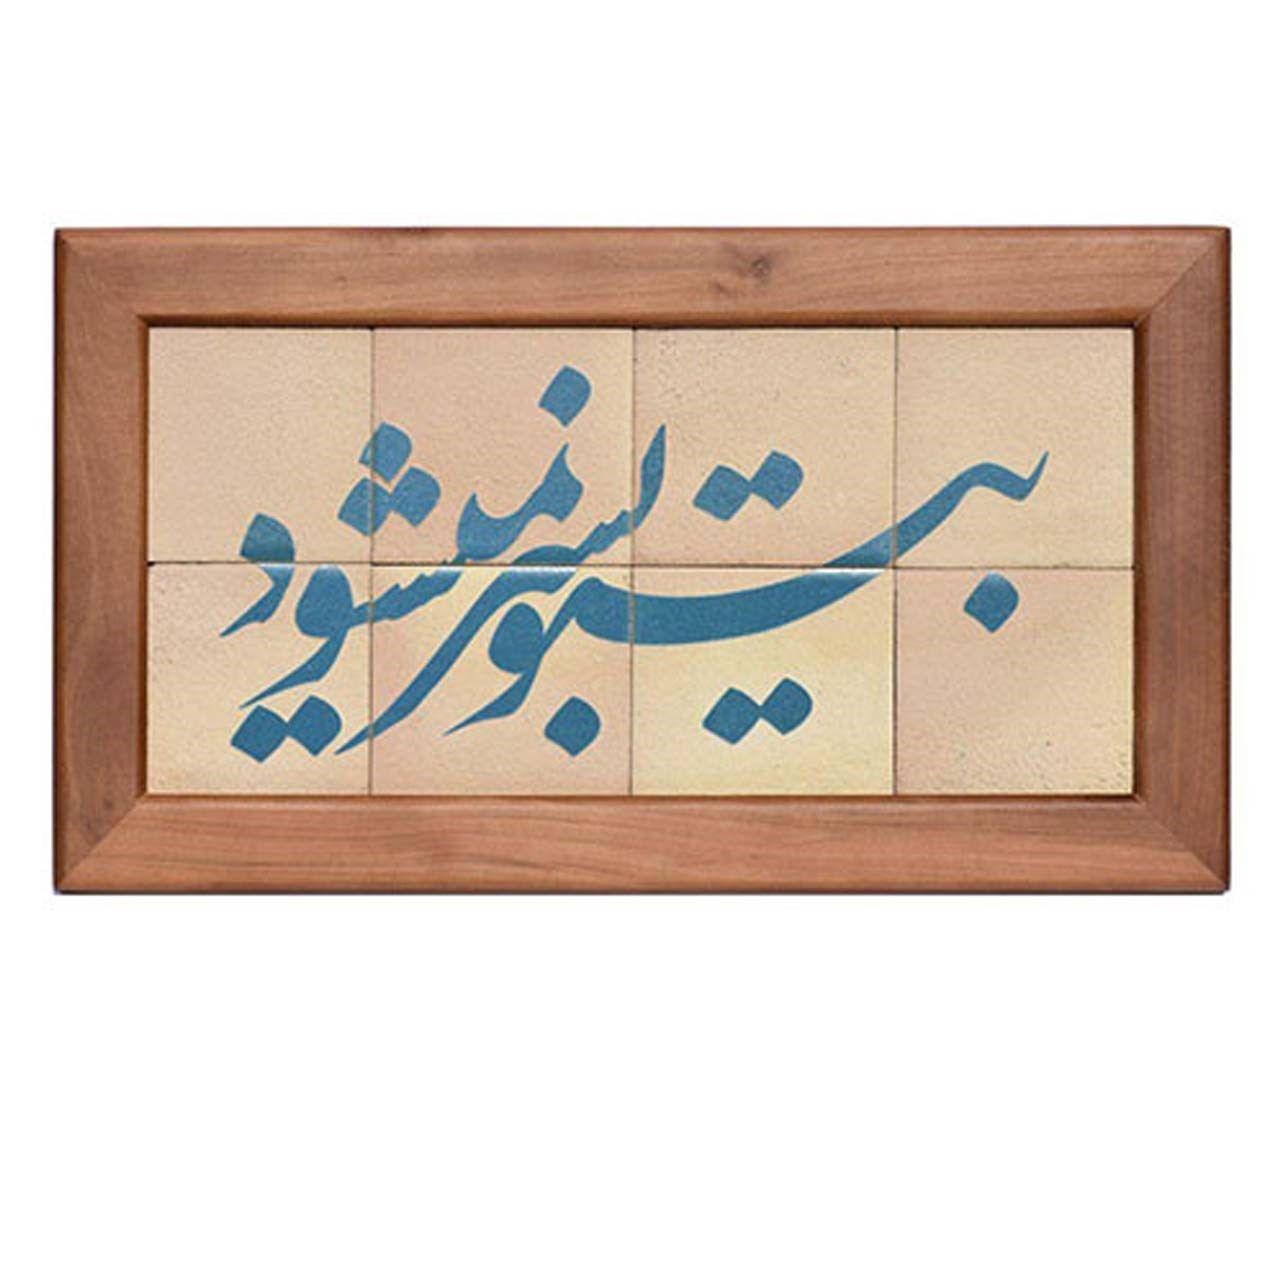 تابلو کاشی سلام طرح بی تو به سر نمیشود